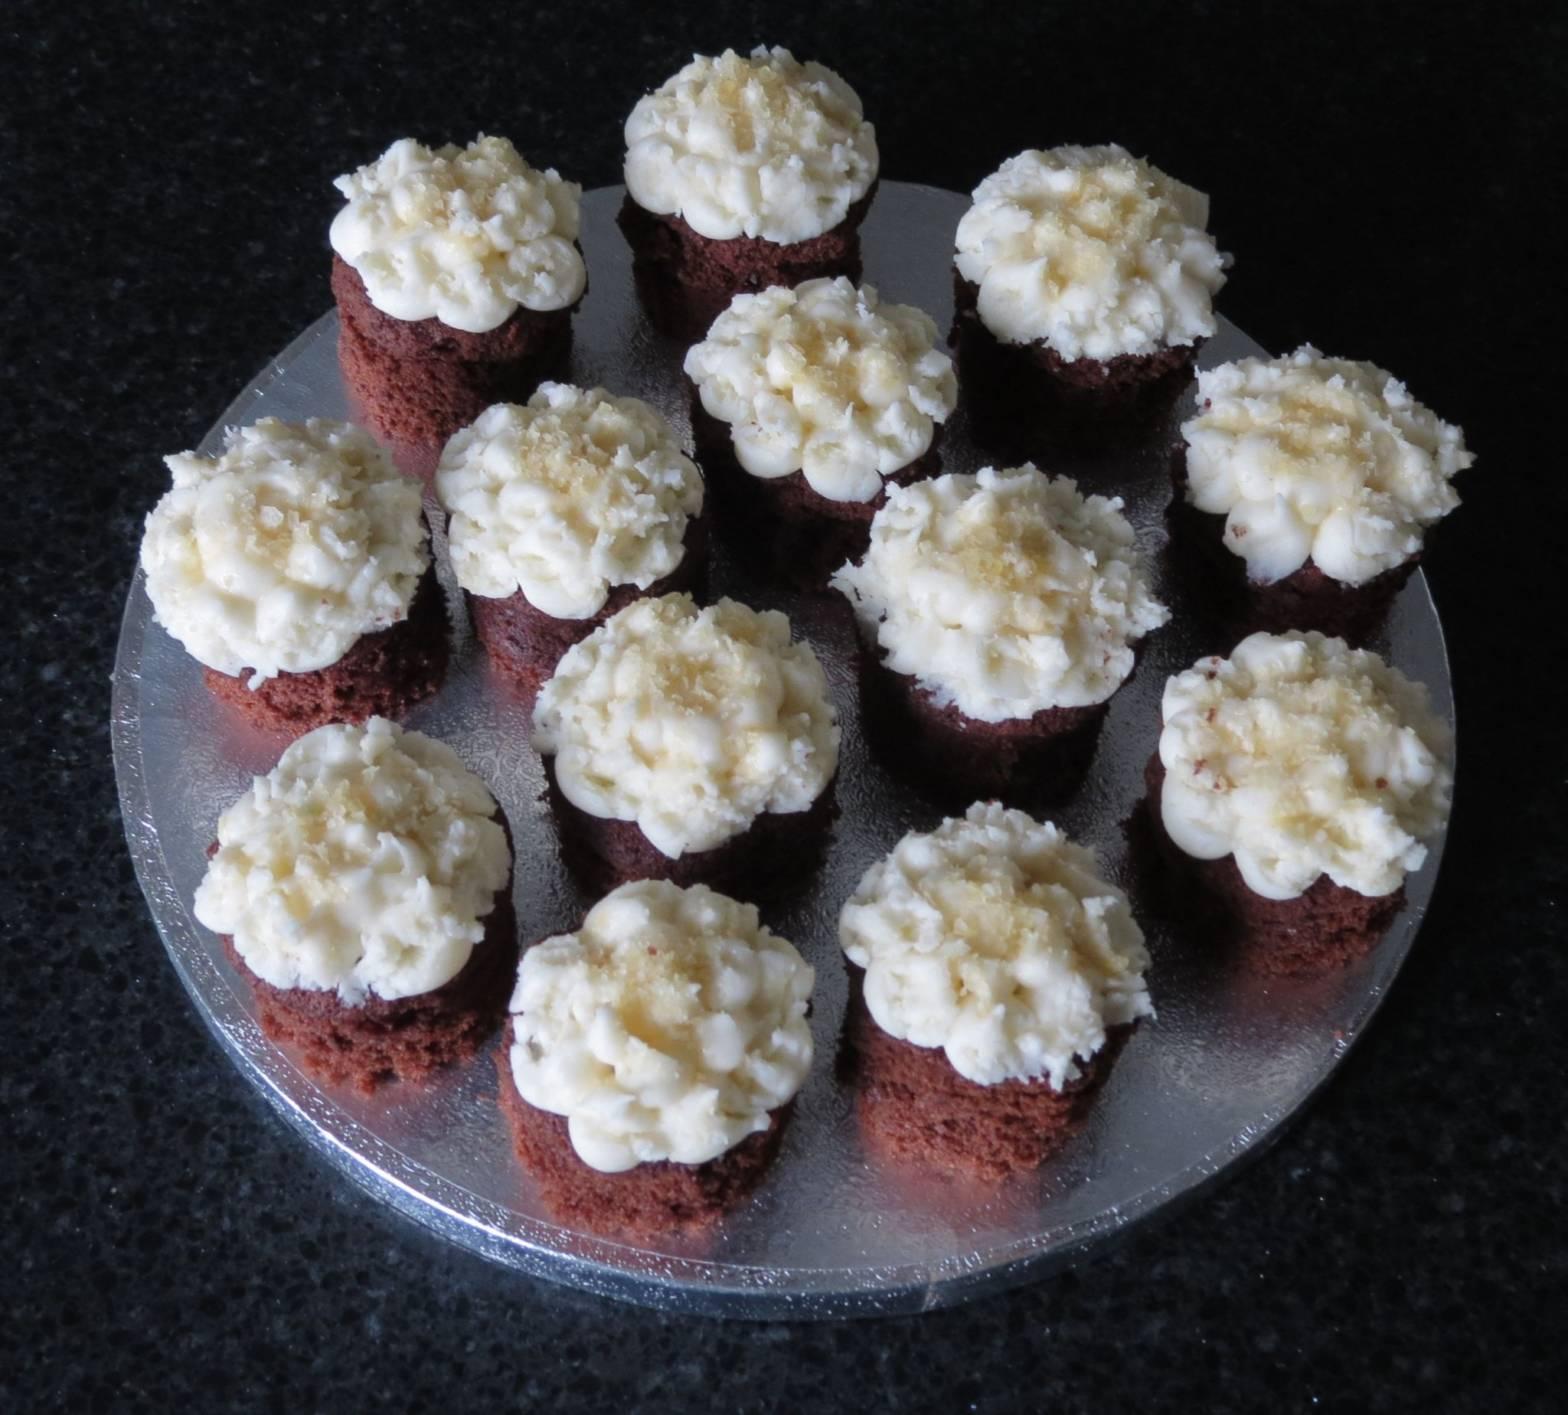 Chocolate Beer Mini Cakes